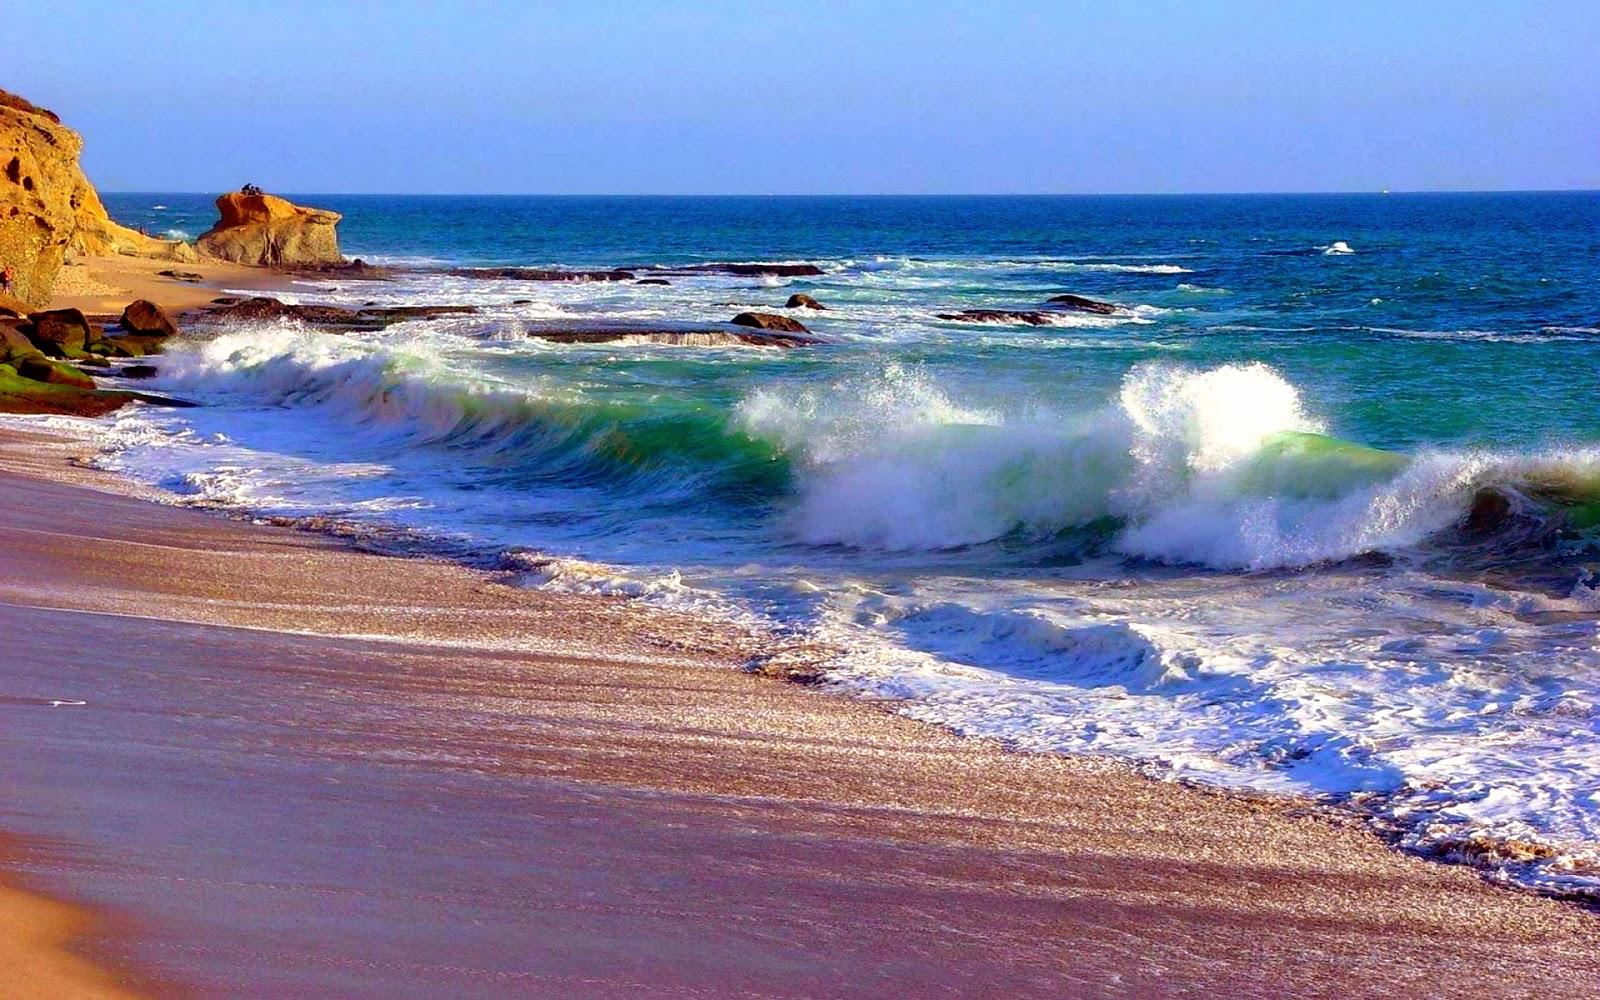 ocean waves wallpaper hd wallpapers